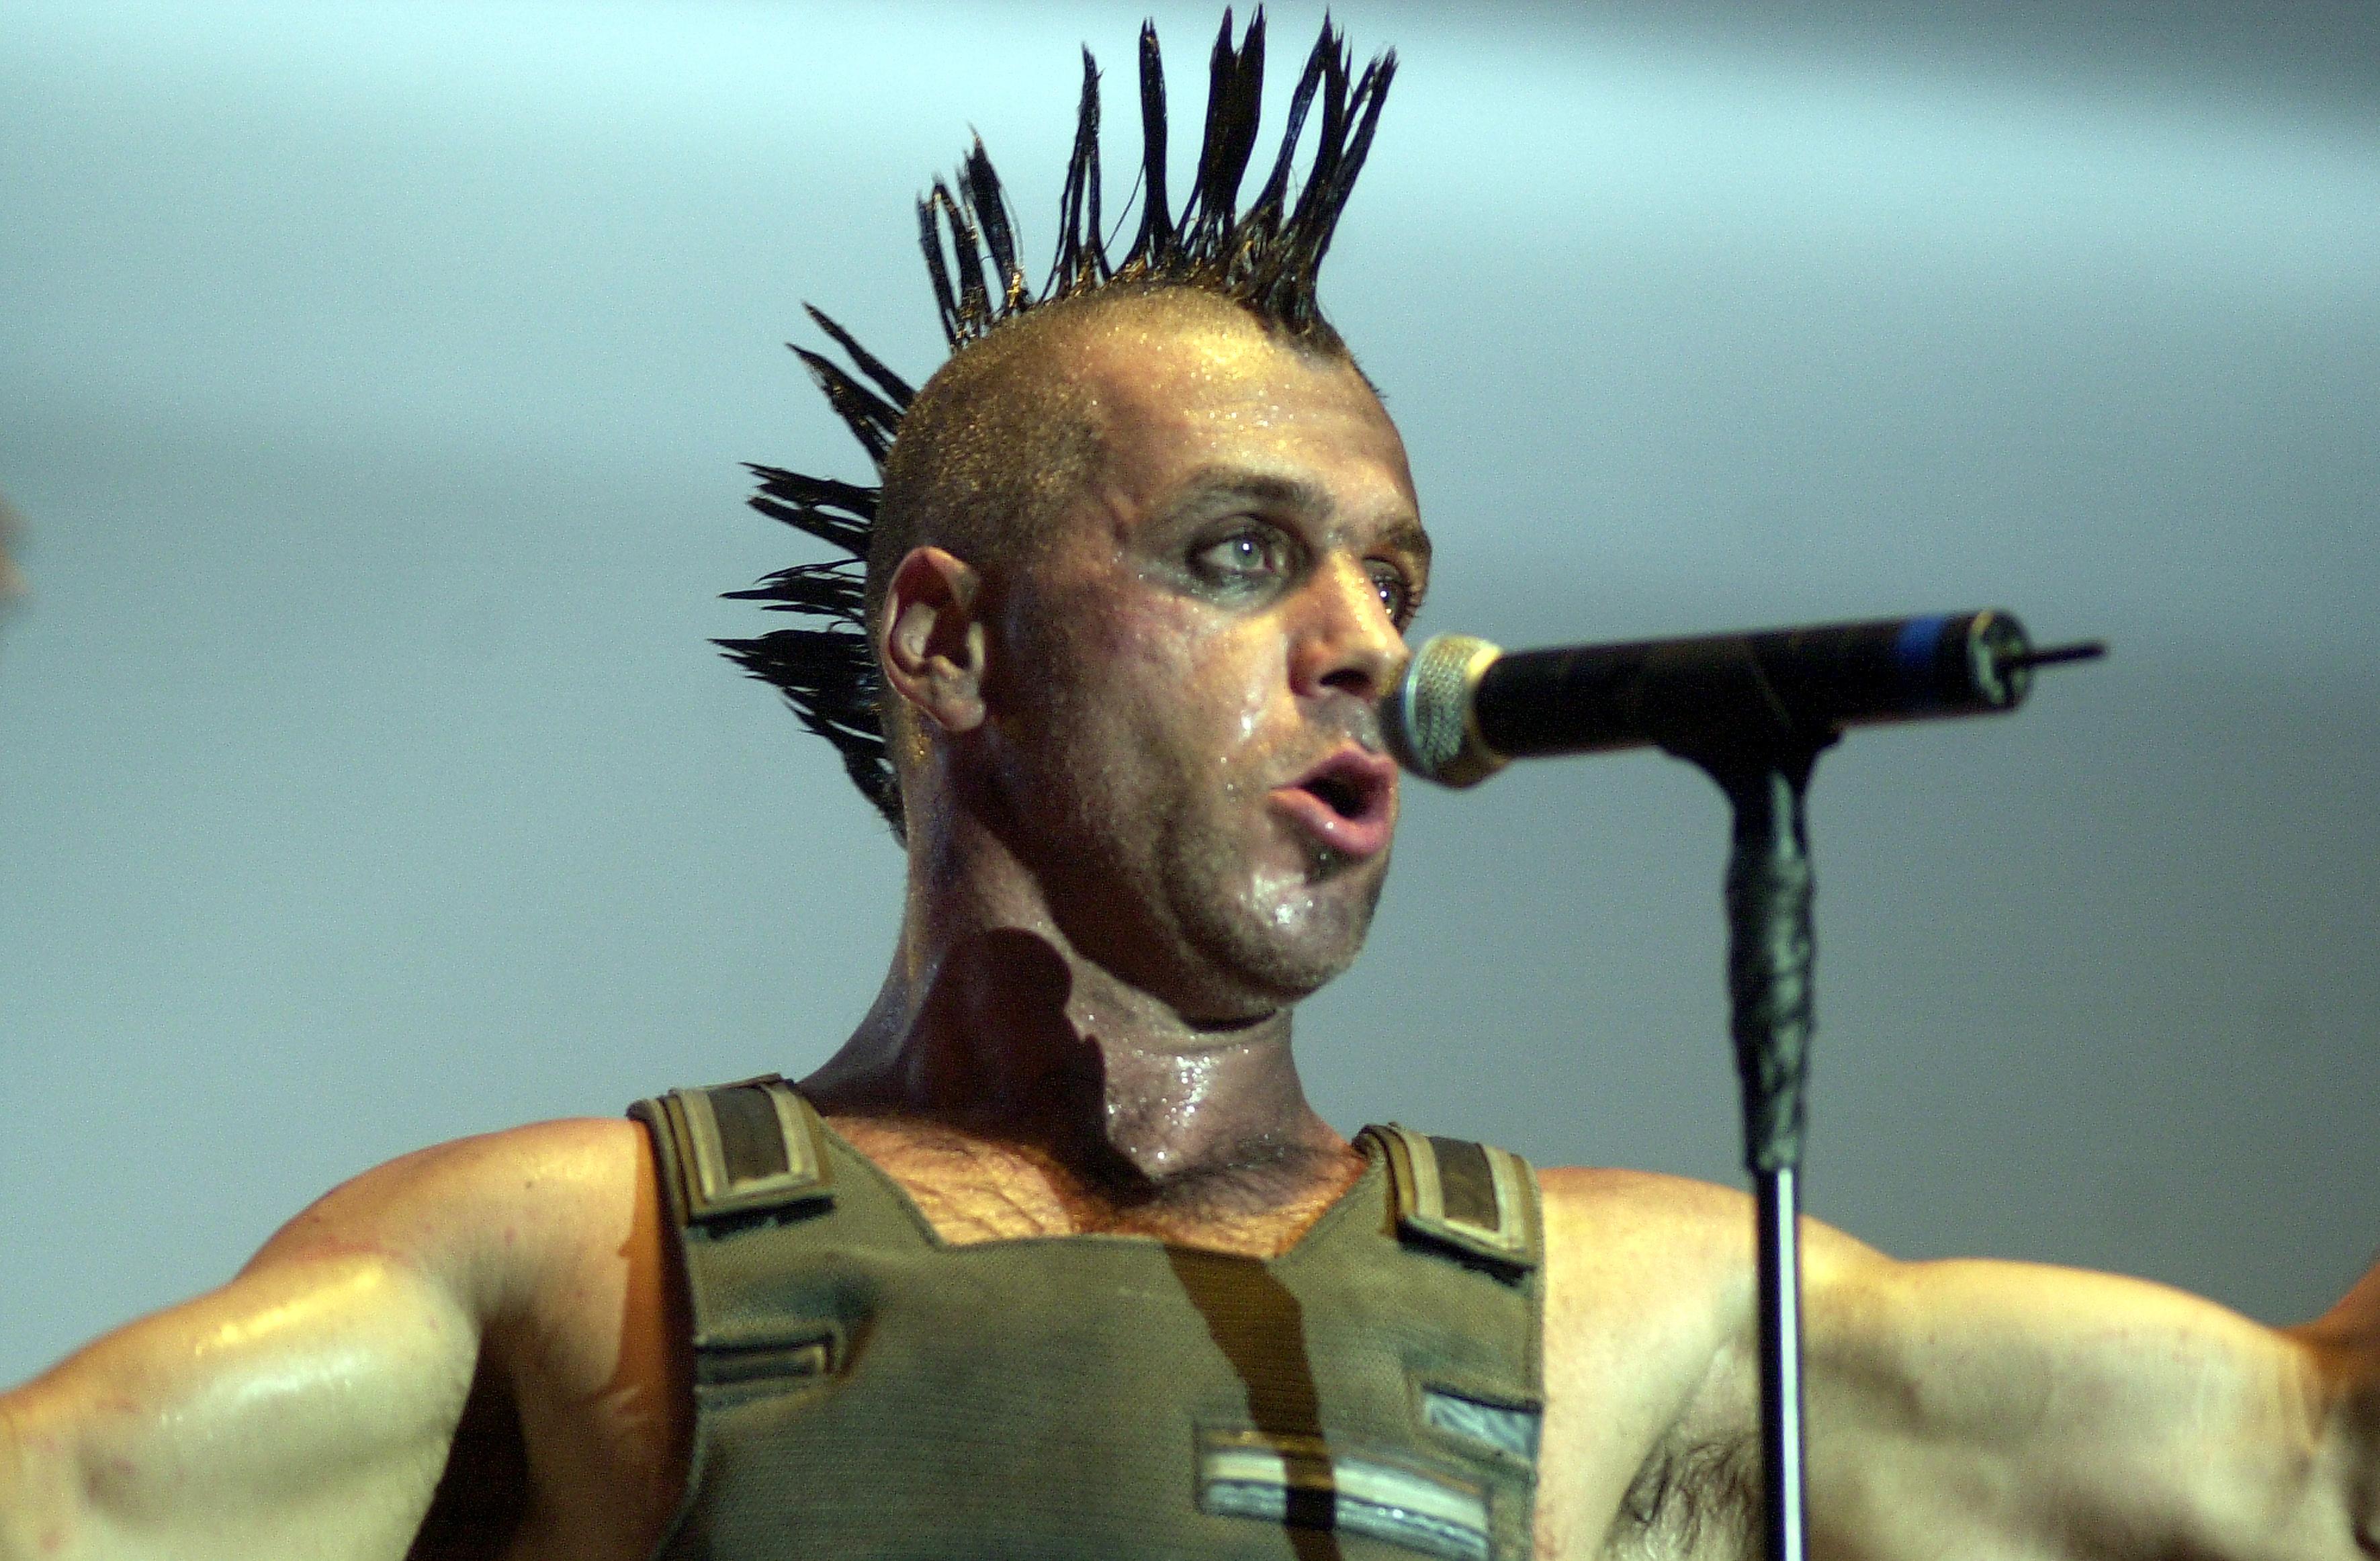 AMSTERDAM, NETHERLANDS - DECEMBER 03: Till Lindemann from Rammstein performs live at Heineken Music Hall in Amsterdam, Nether